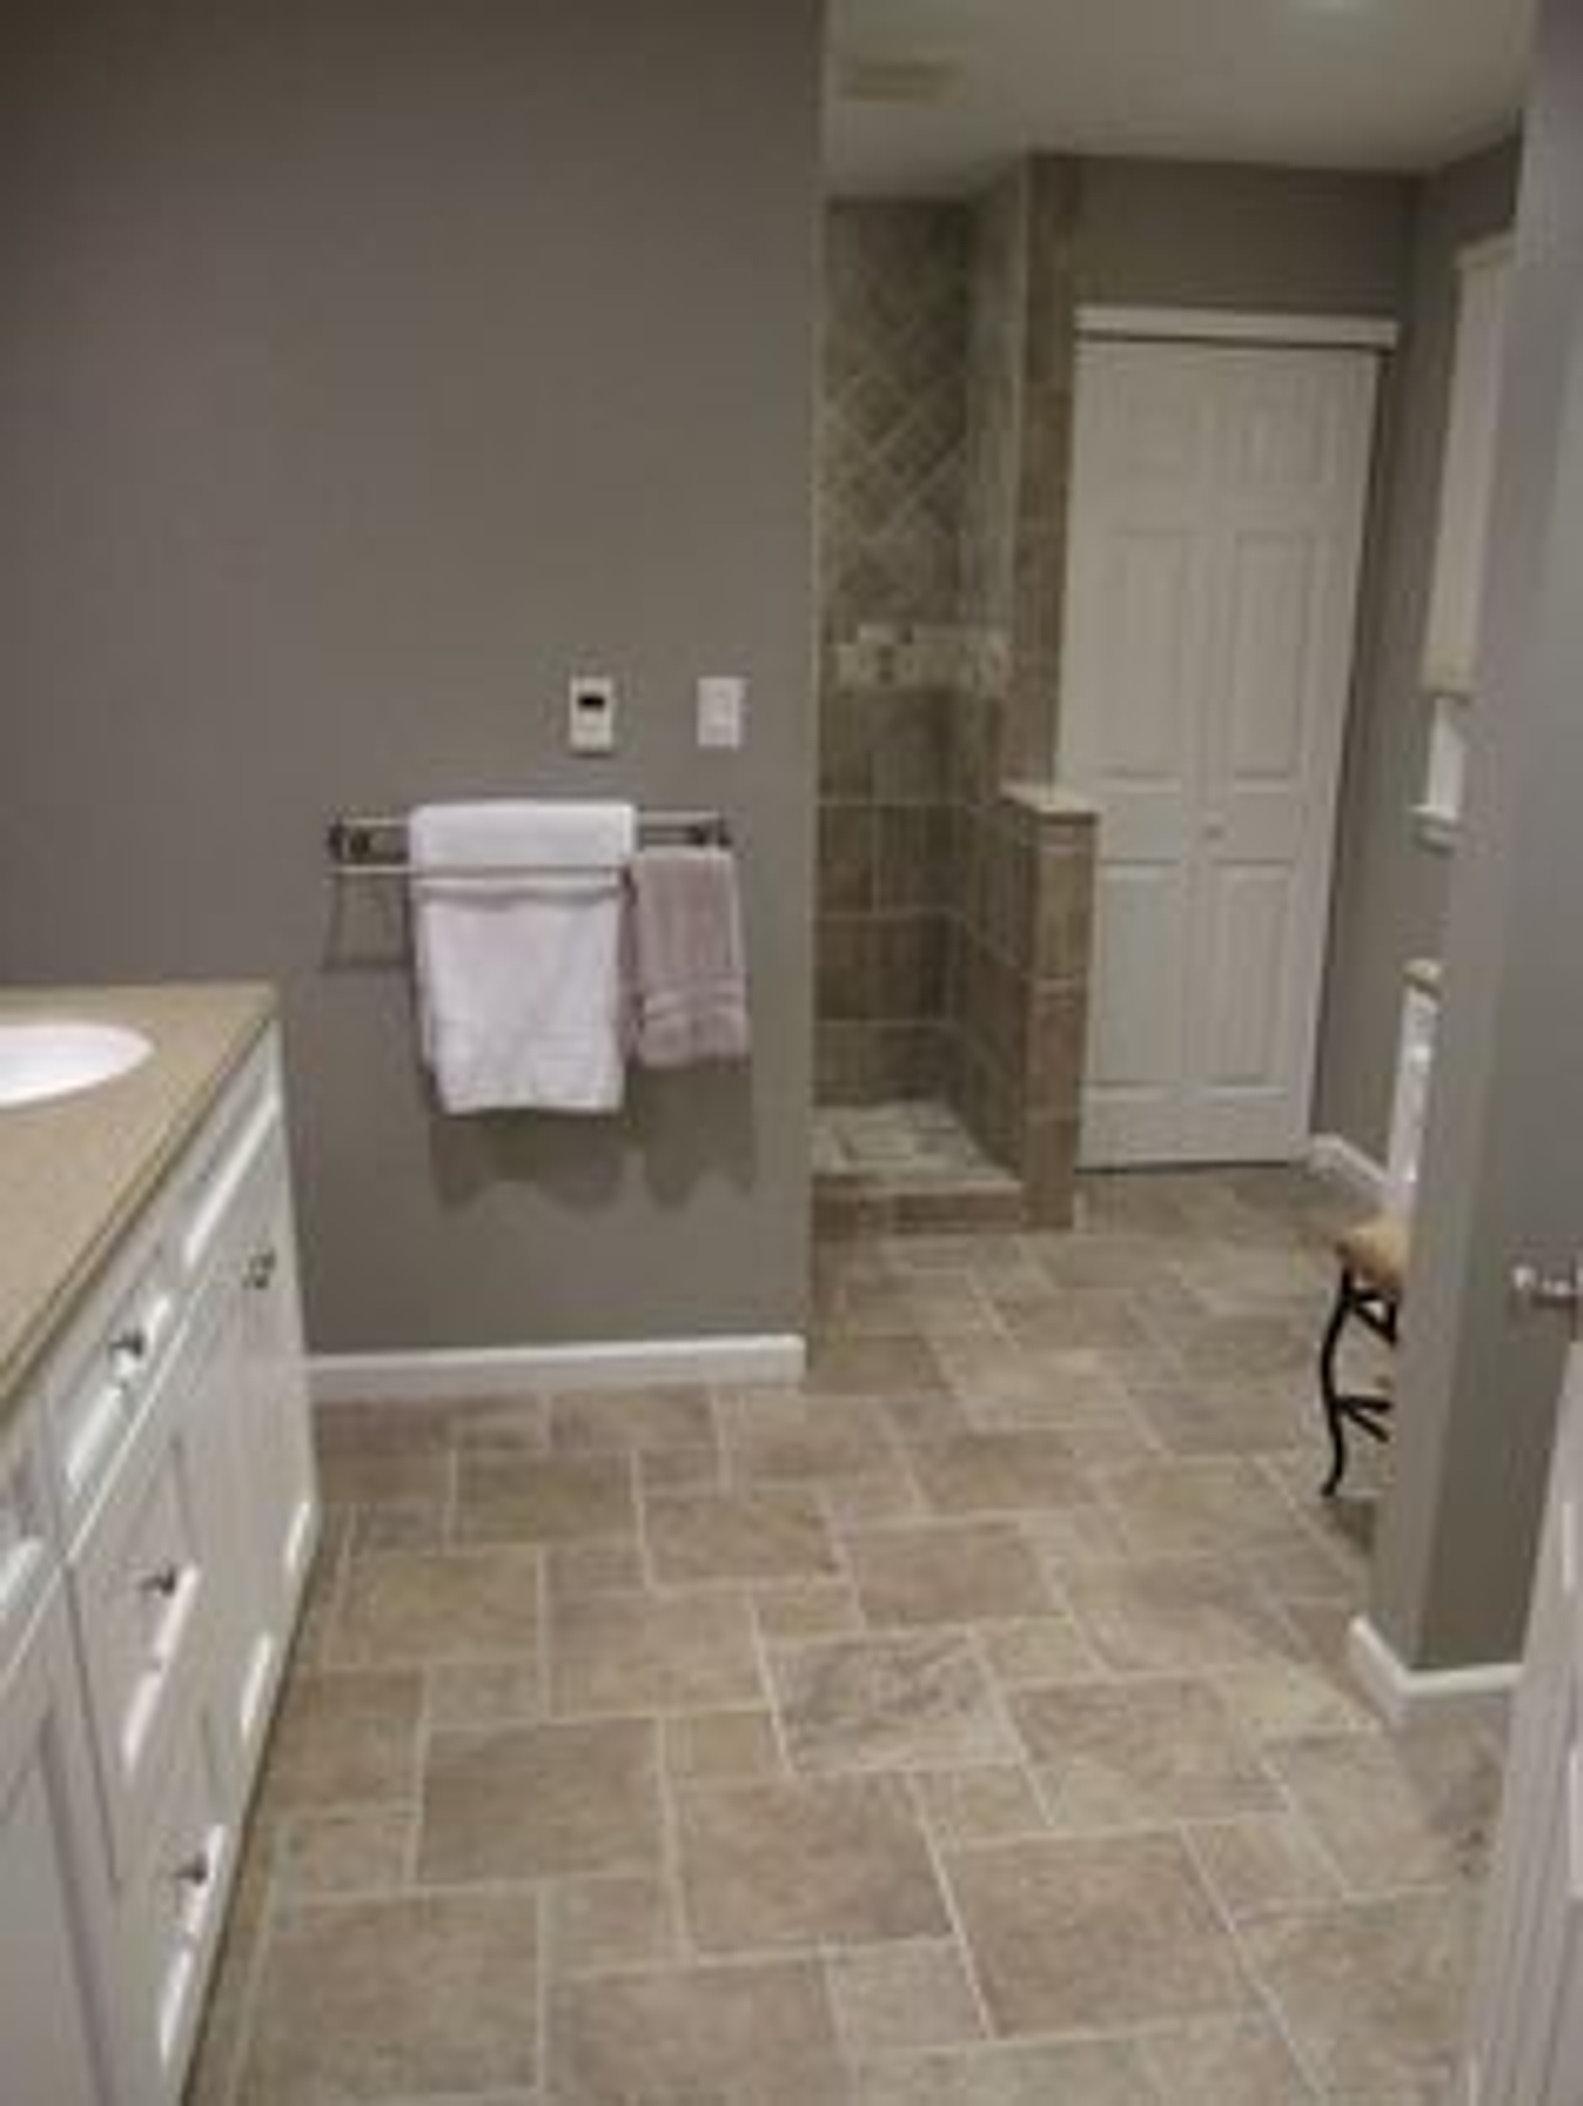 Bathroom Remodeling Woodstock Ga all in one home restoration & remodeling